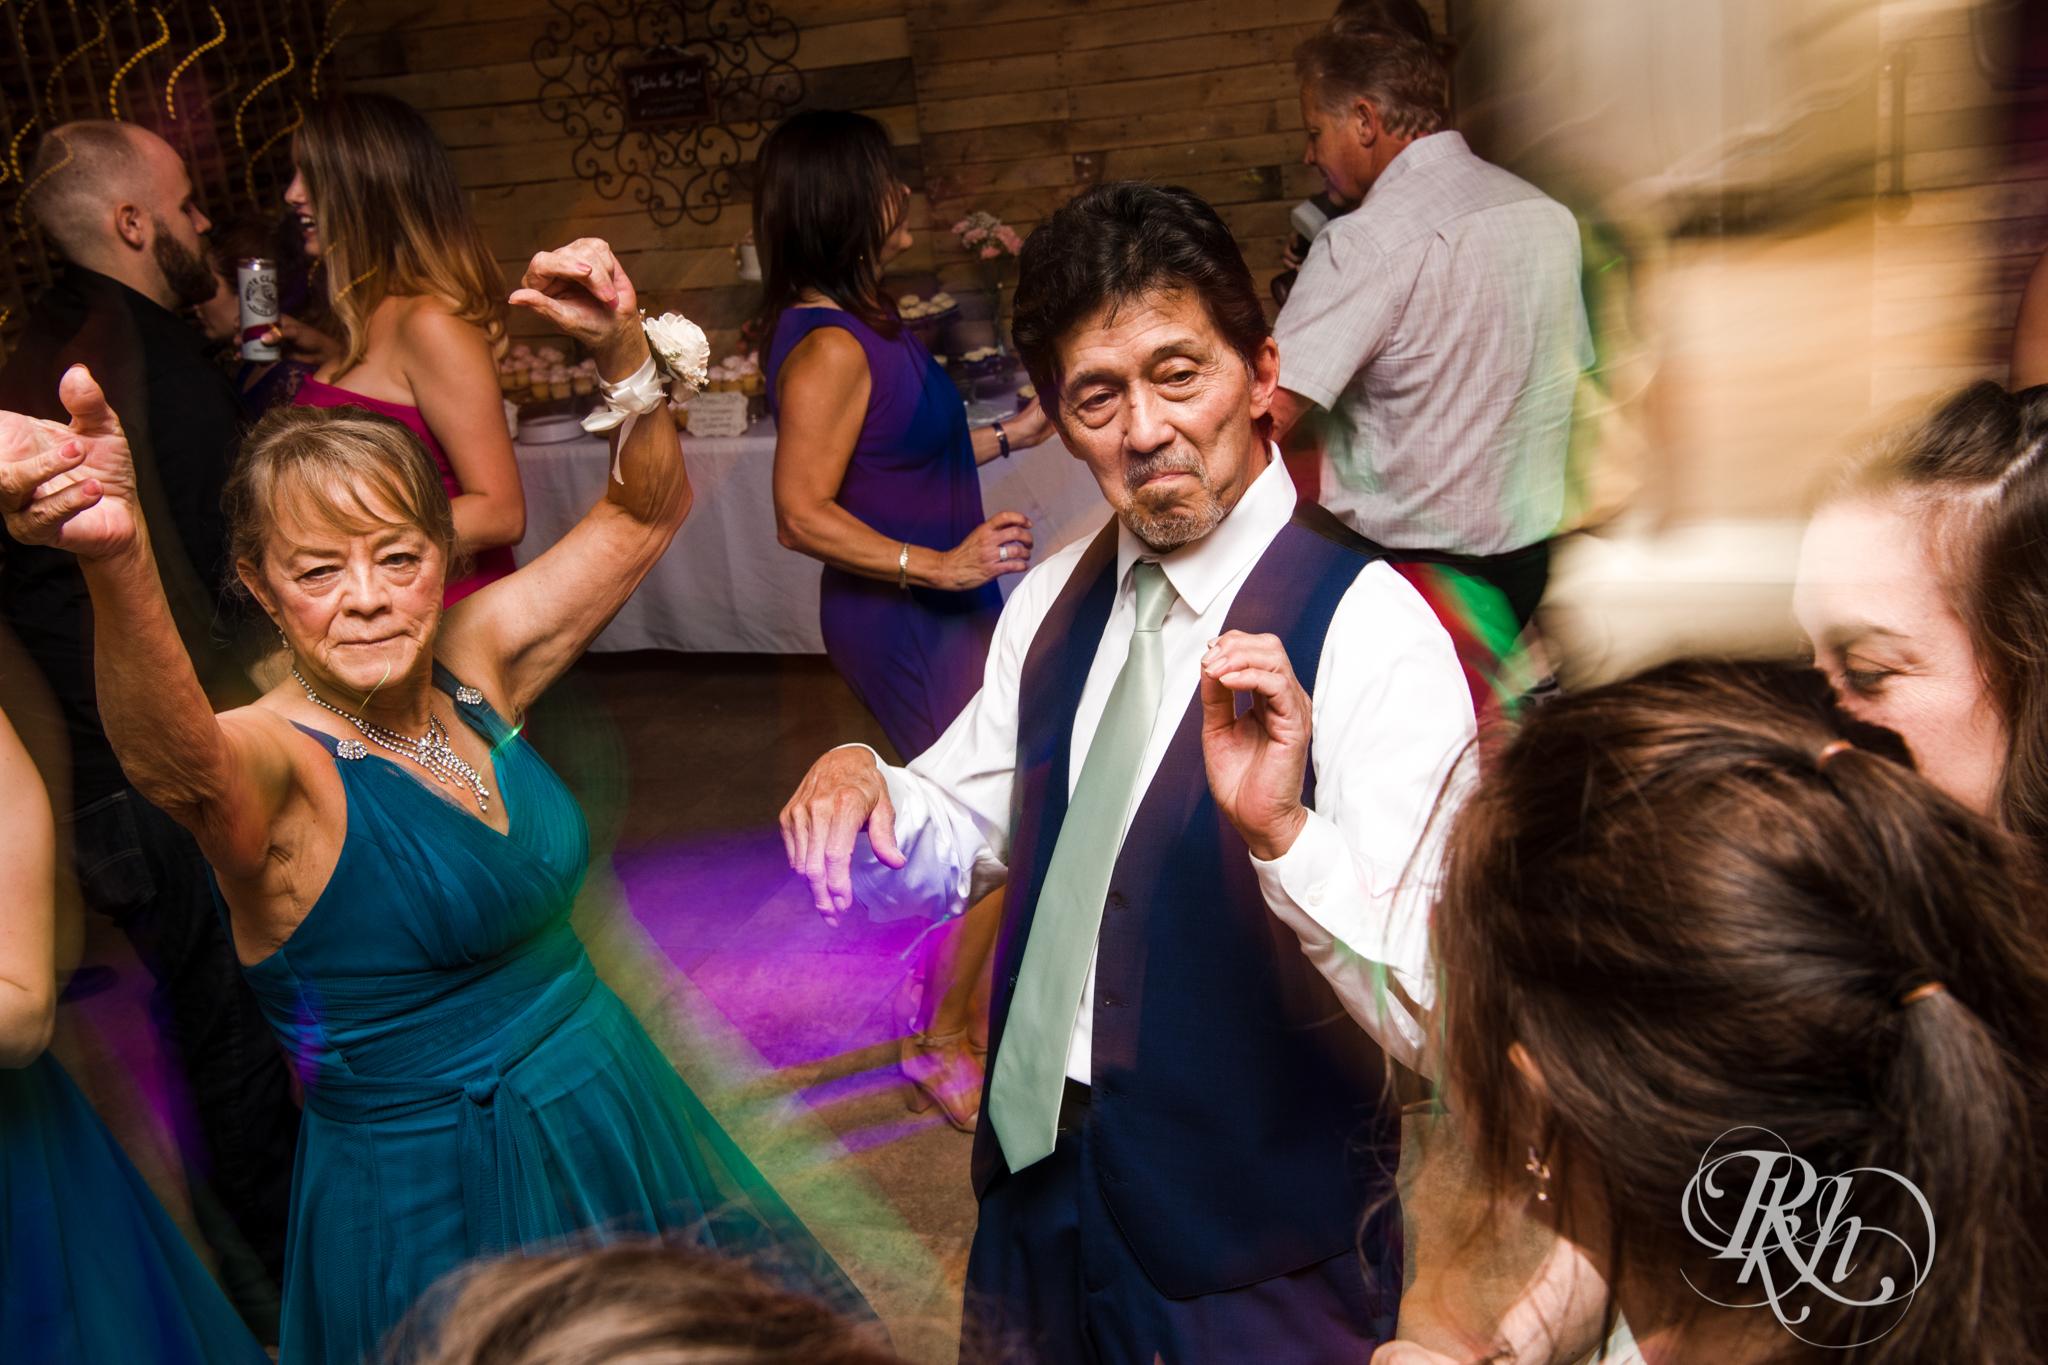 Ally & Nick - Minnesota Wedding Photography - Next Chapter Winery - RKH Images - Blog (53 of 57).jpg